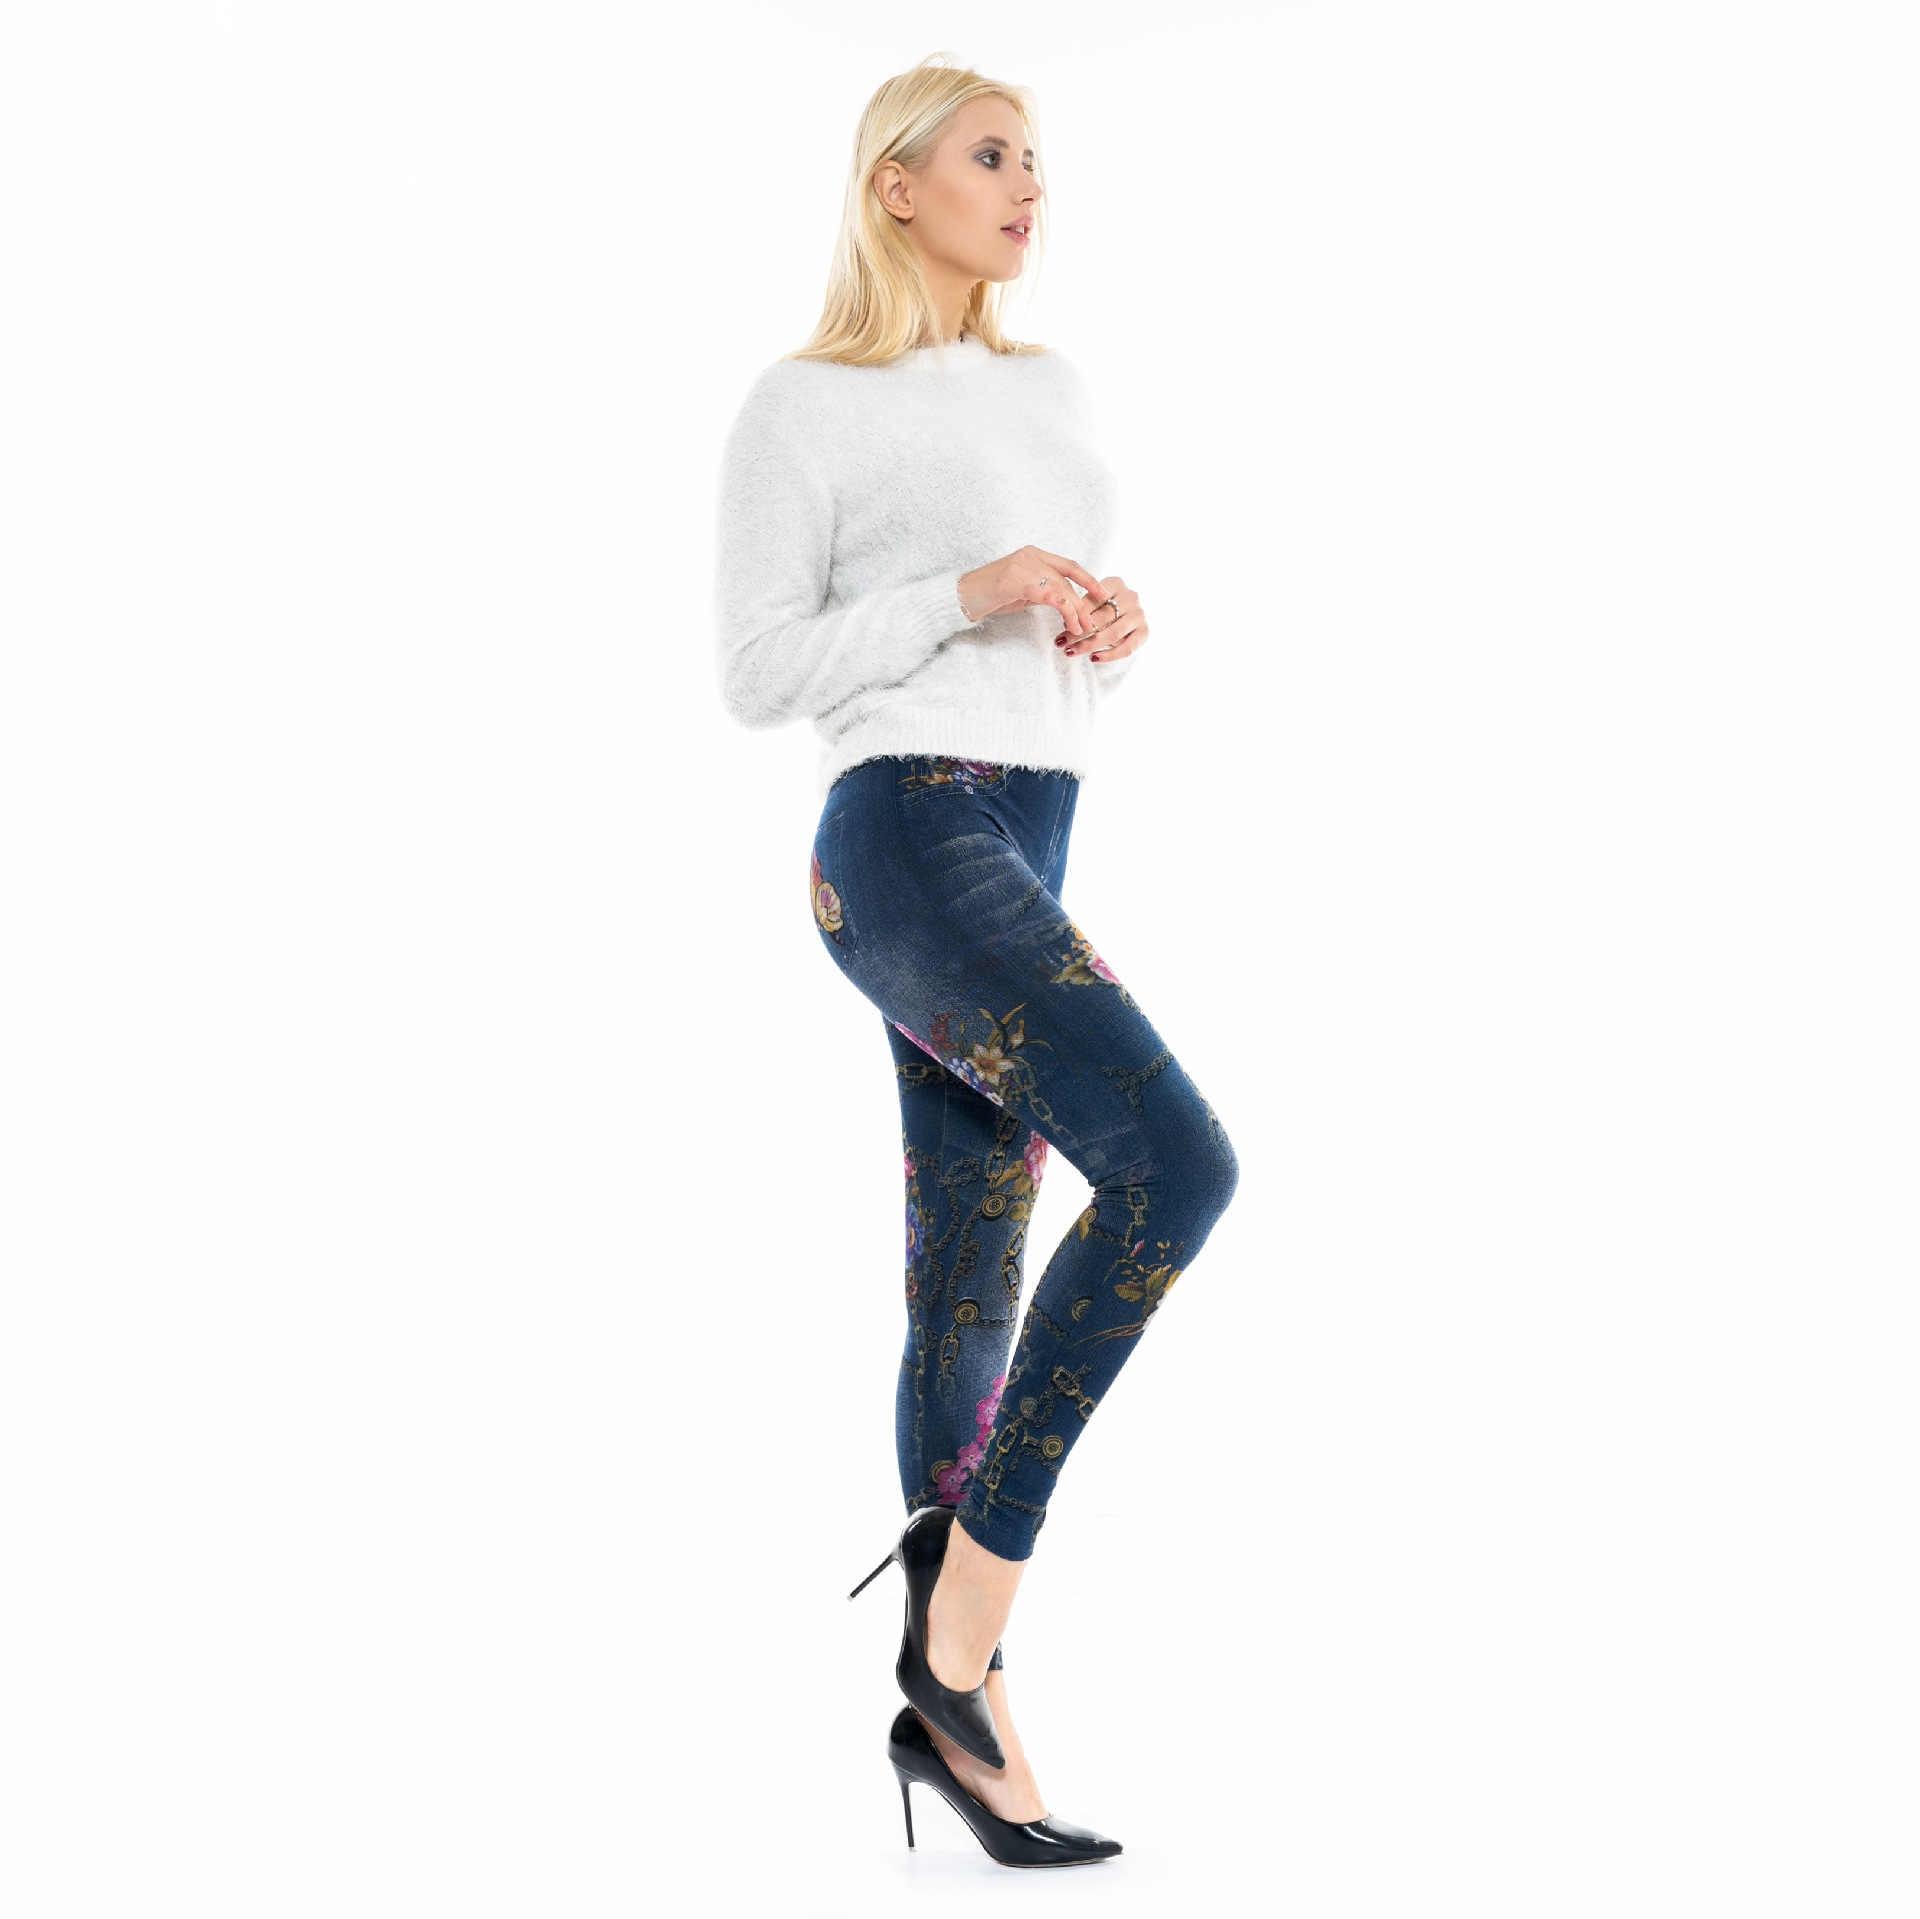 2de59bdfd4824 ... Faux Denim Jeans Leggings Butterfly Flower Print Leggings Women  Imitation Jean Slim Fitness Leggings Elastic Seamless ...